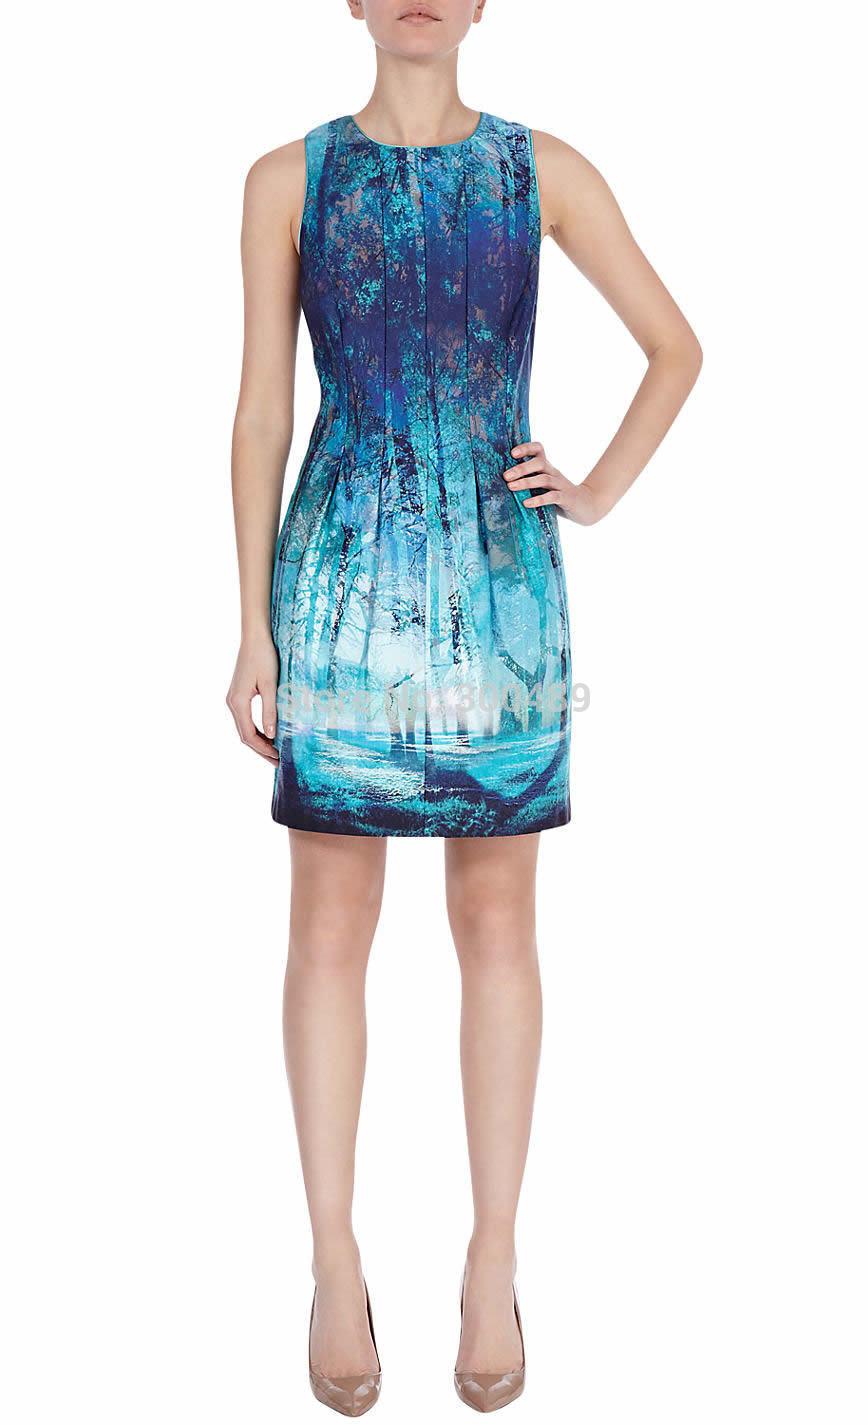 Fashion Print Women Macie Dress Elegant Draped Party Dresses 1487(China (Mainland))